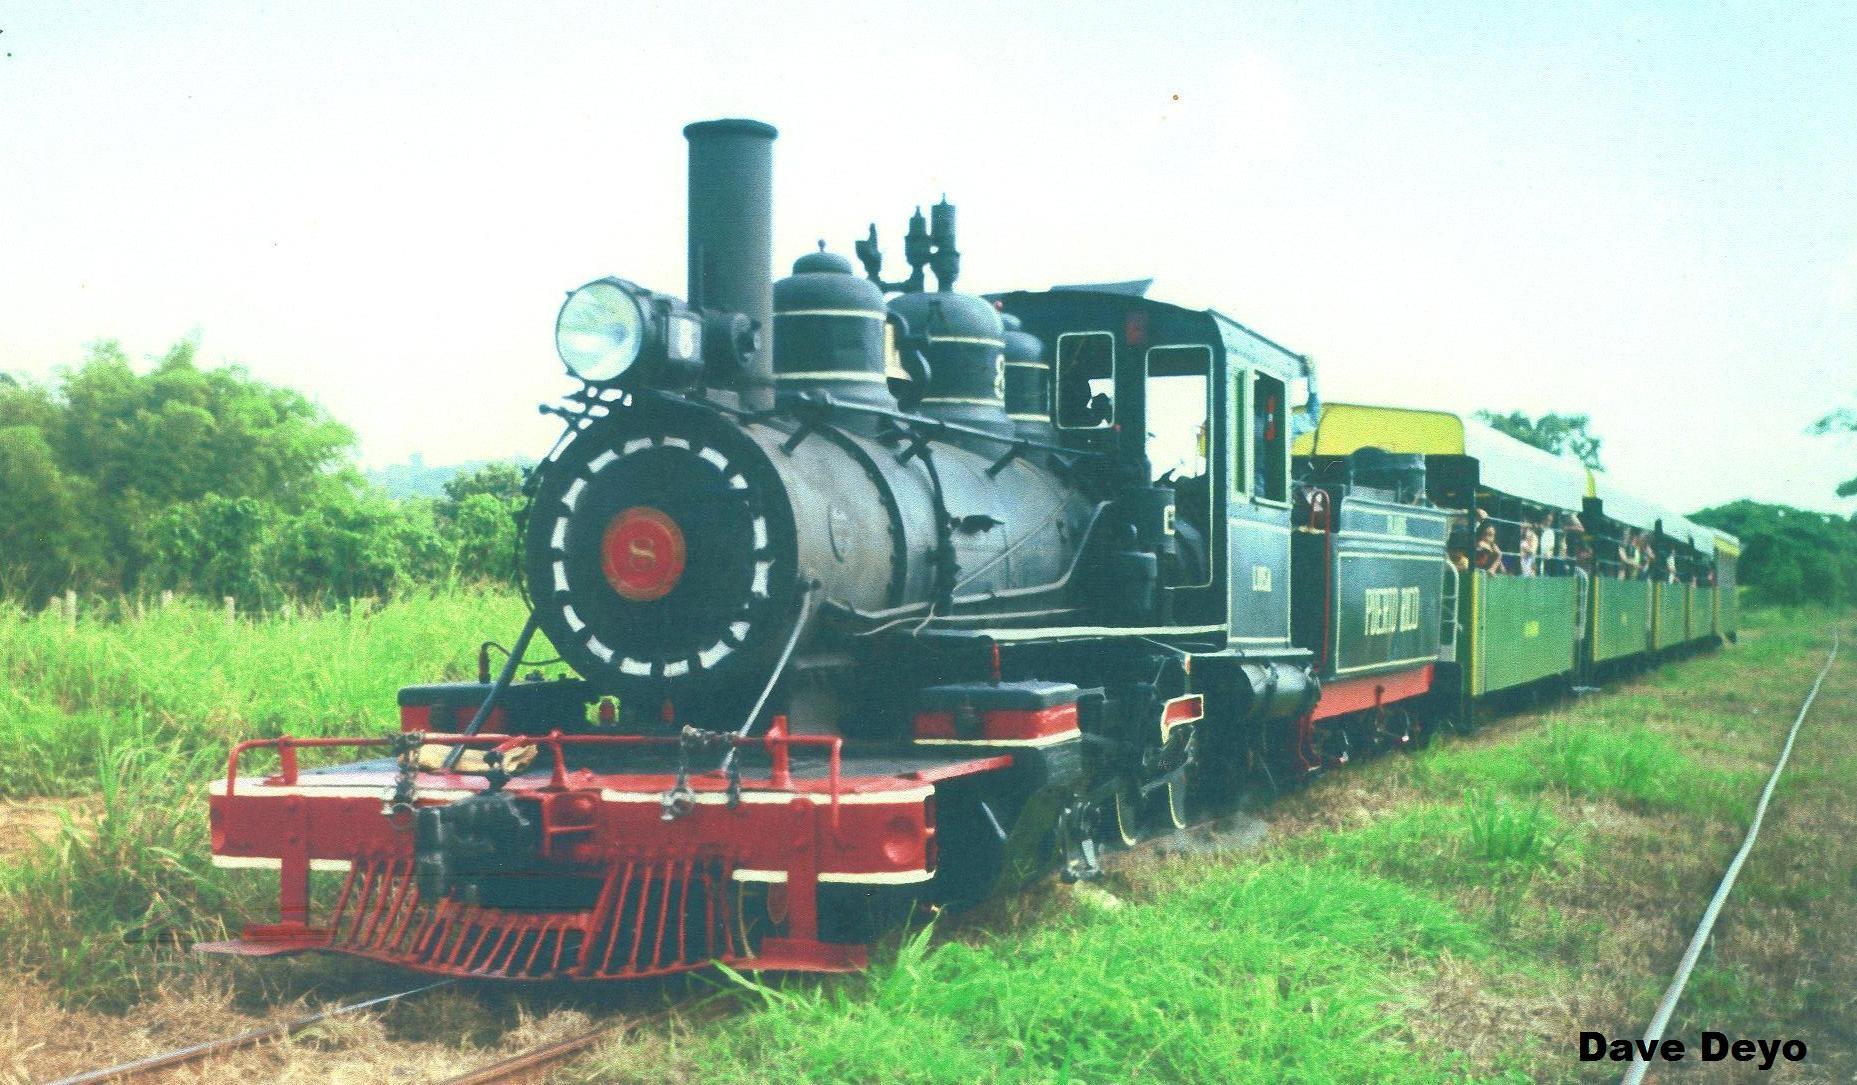 http://ferrocarrilespr.rogerseducationalpage.com/wp-content/uploads/2012/06/fajardotourist.jpg